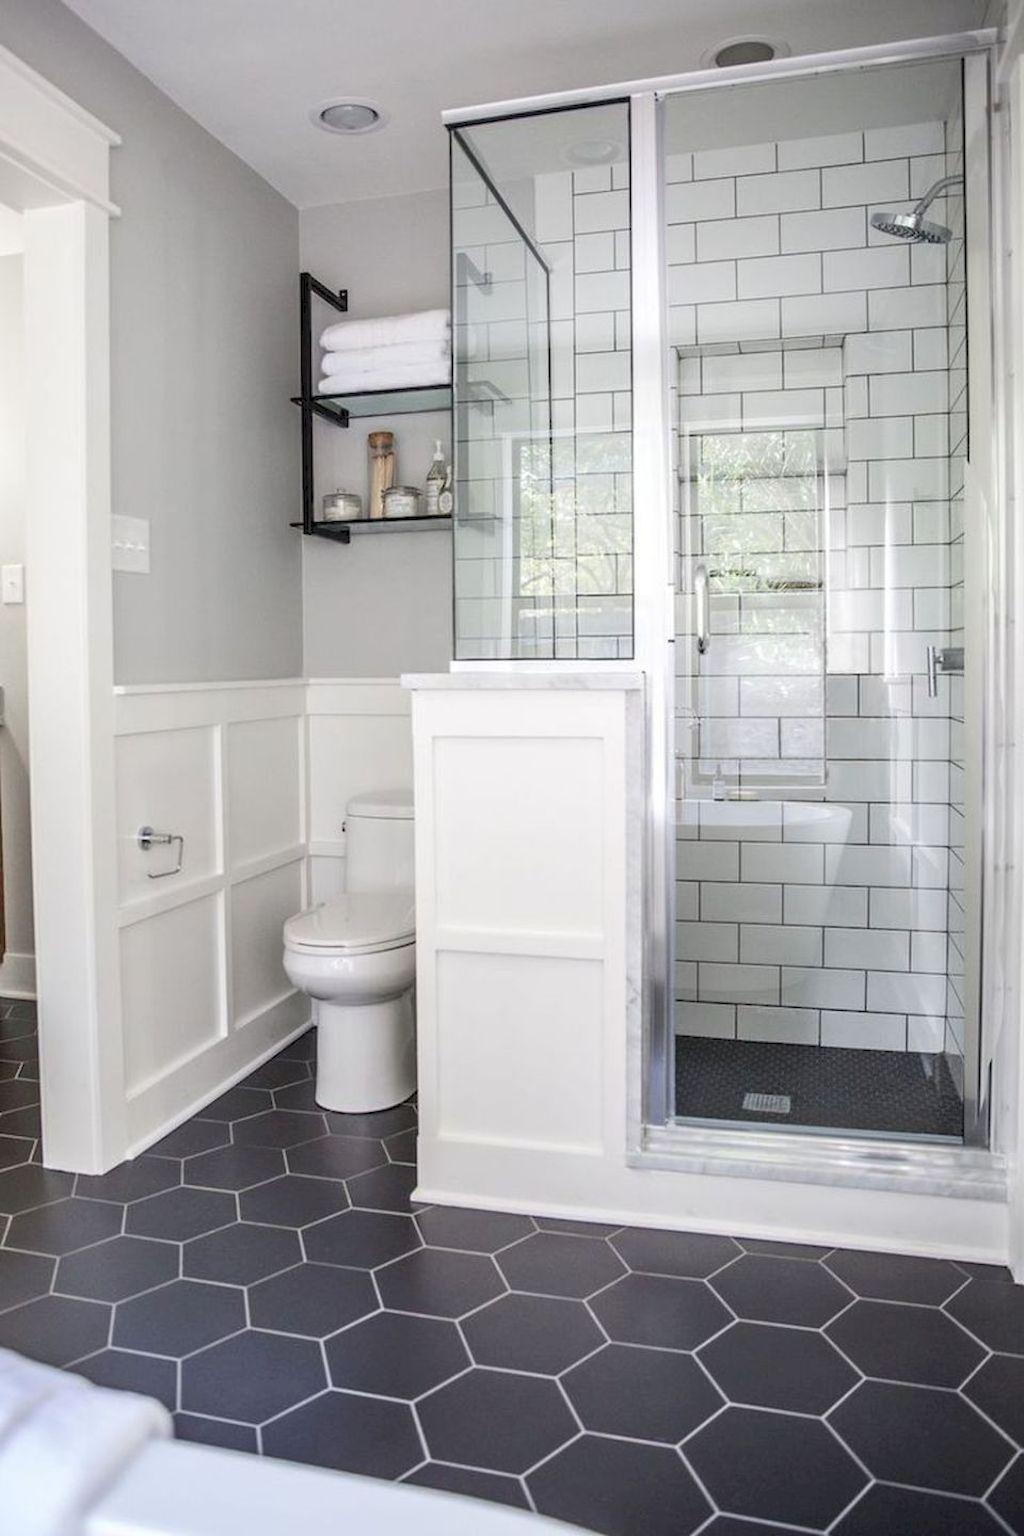 Gorgeous Rustic Master Bathroom Remodel Ideas 45 Small Bathroom Remodel Bathroom Remodel Master Master Bathroom Renovation